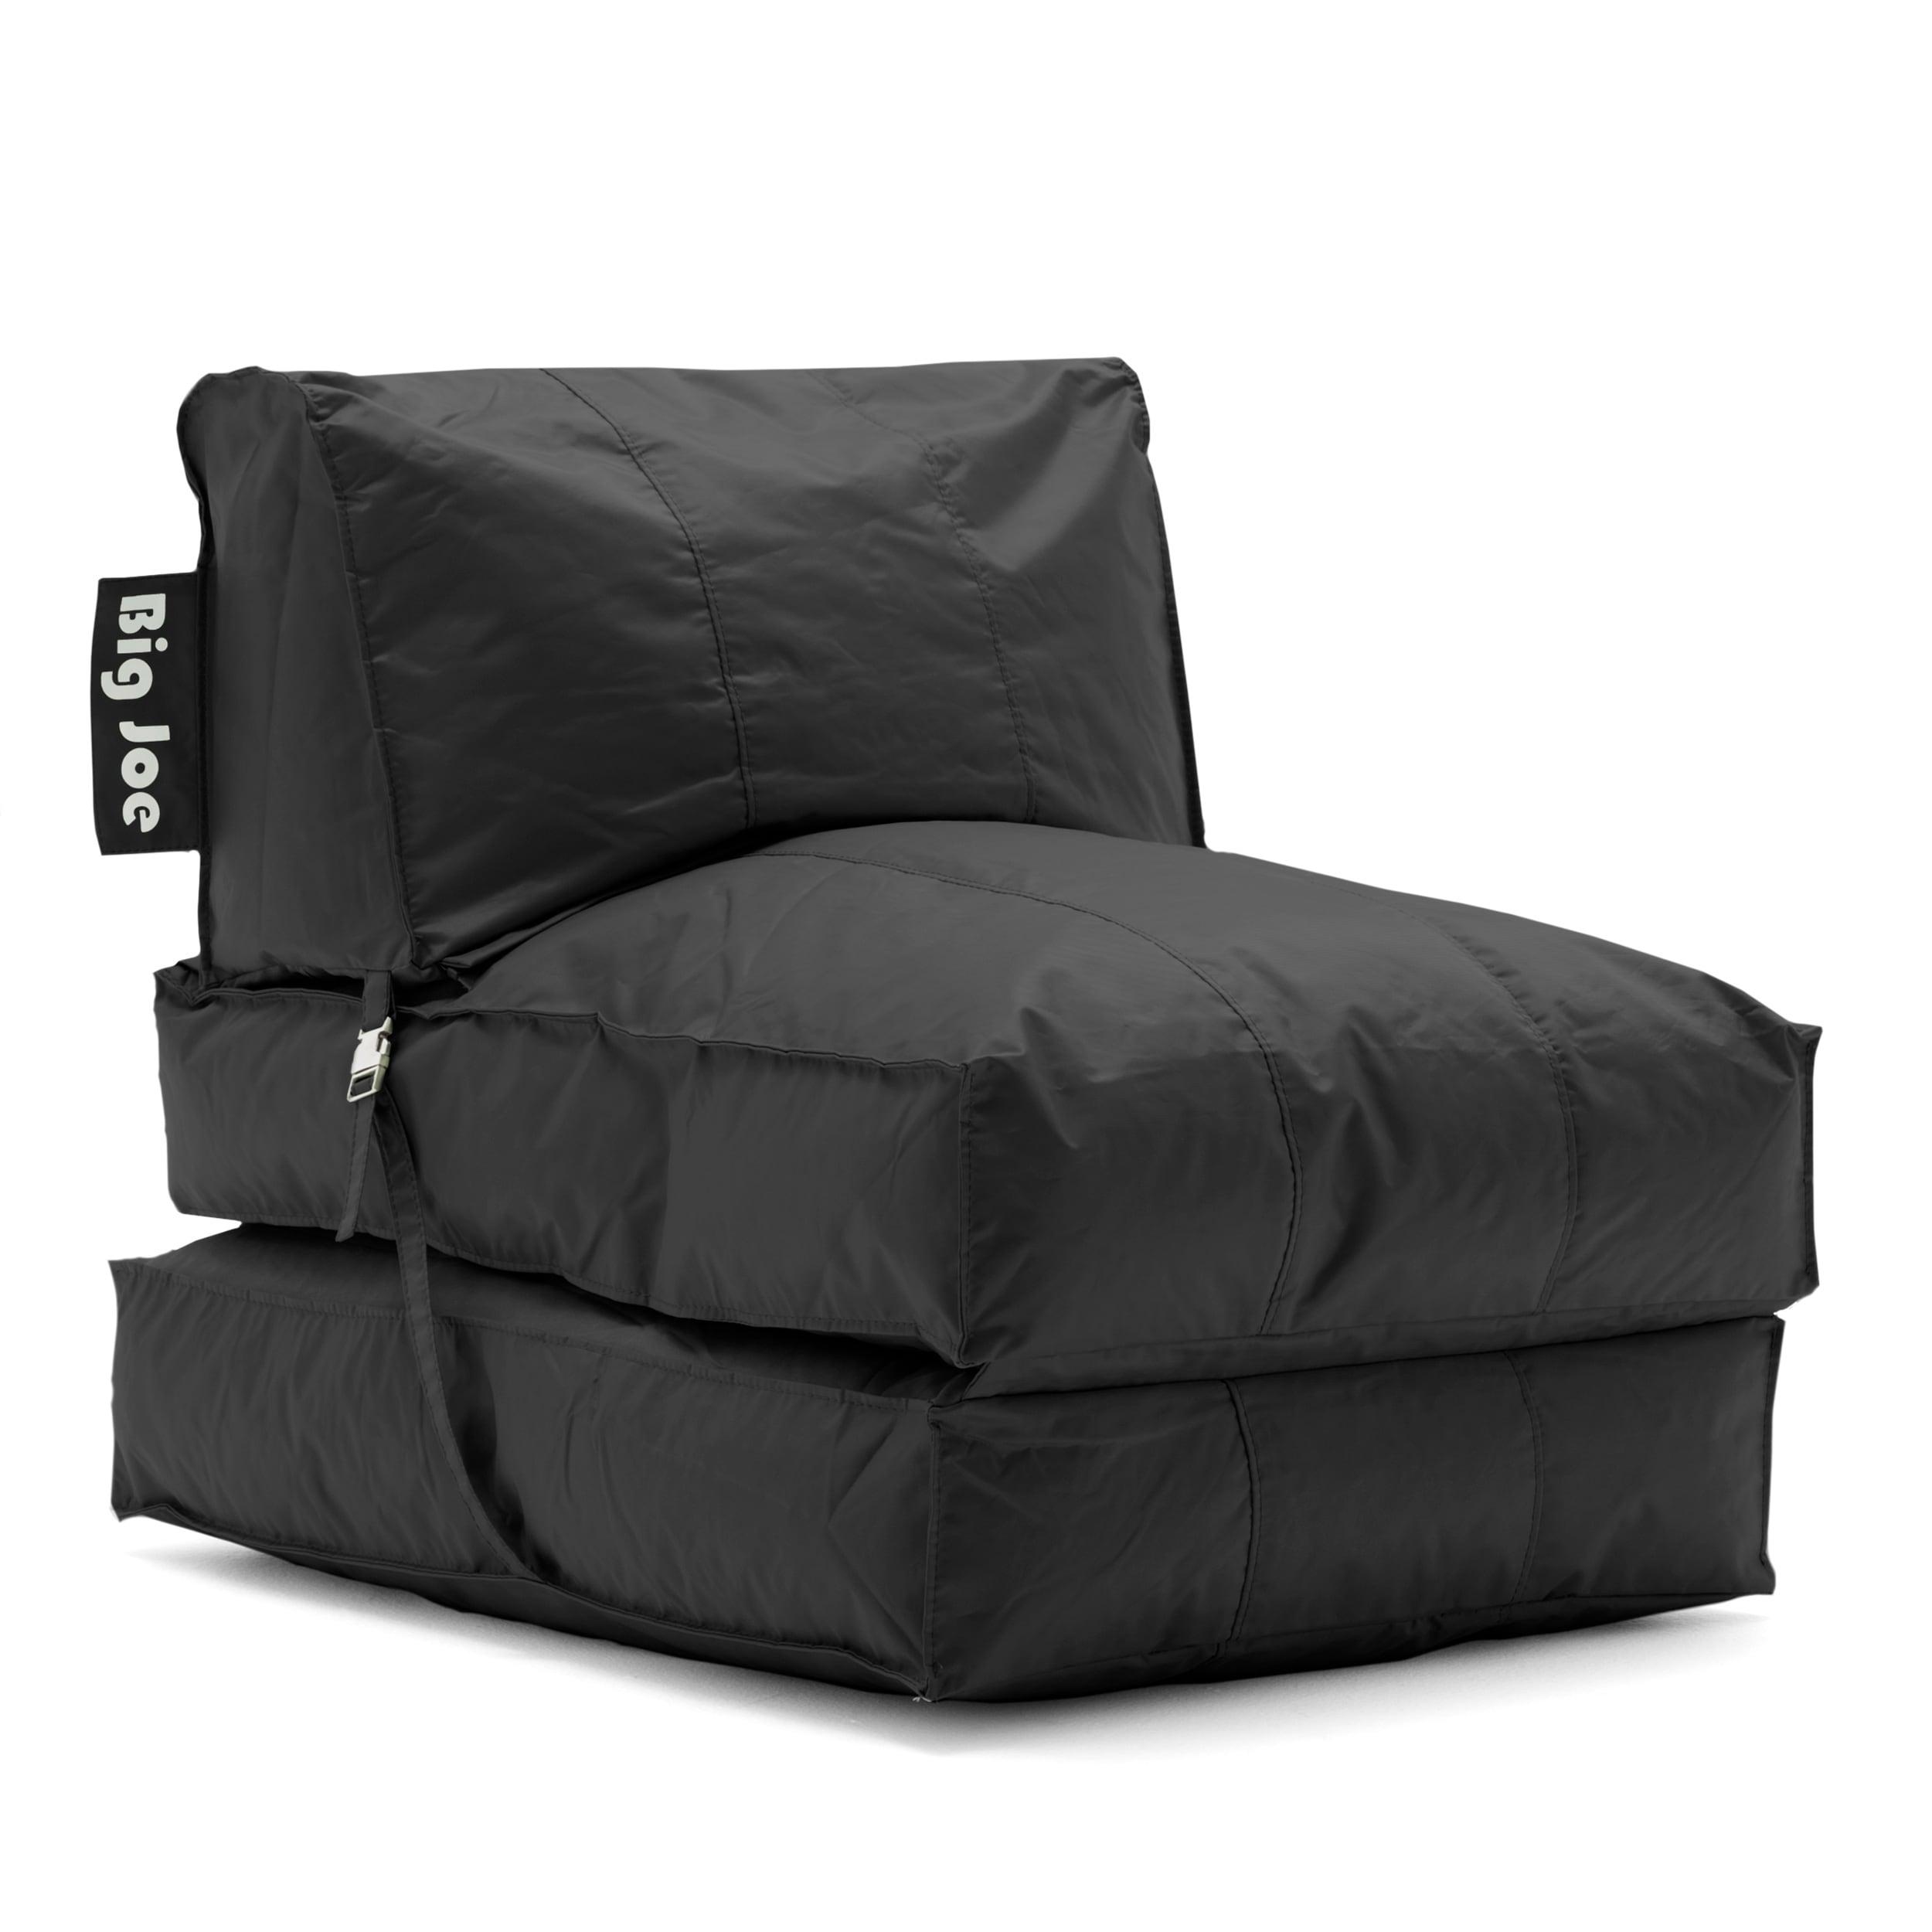 Shop Big Joe Flip Lounger Bean Bag Chair   Free Shipping Today    Overstock.com   19759192